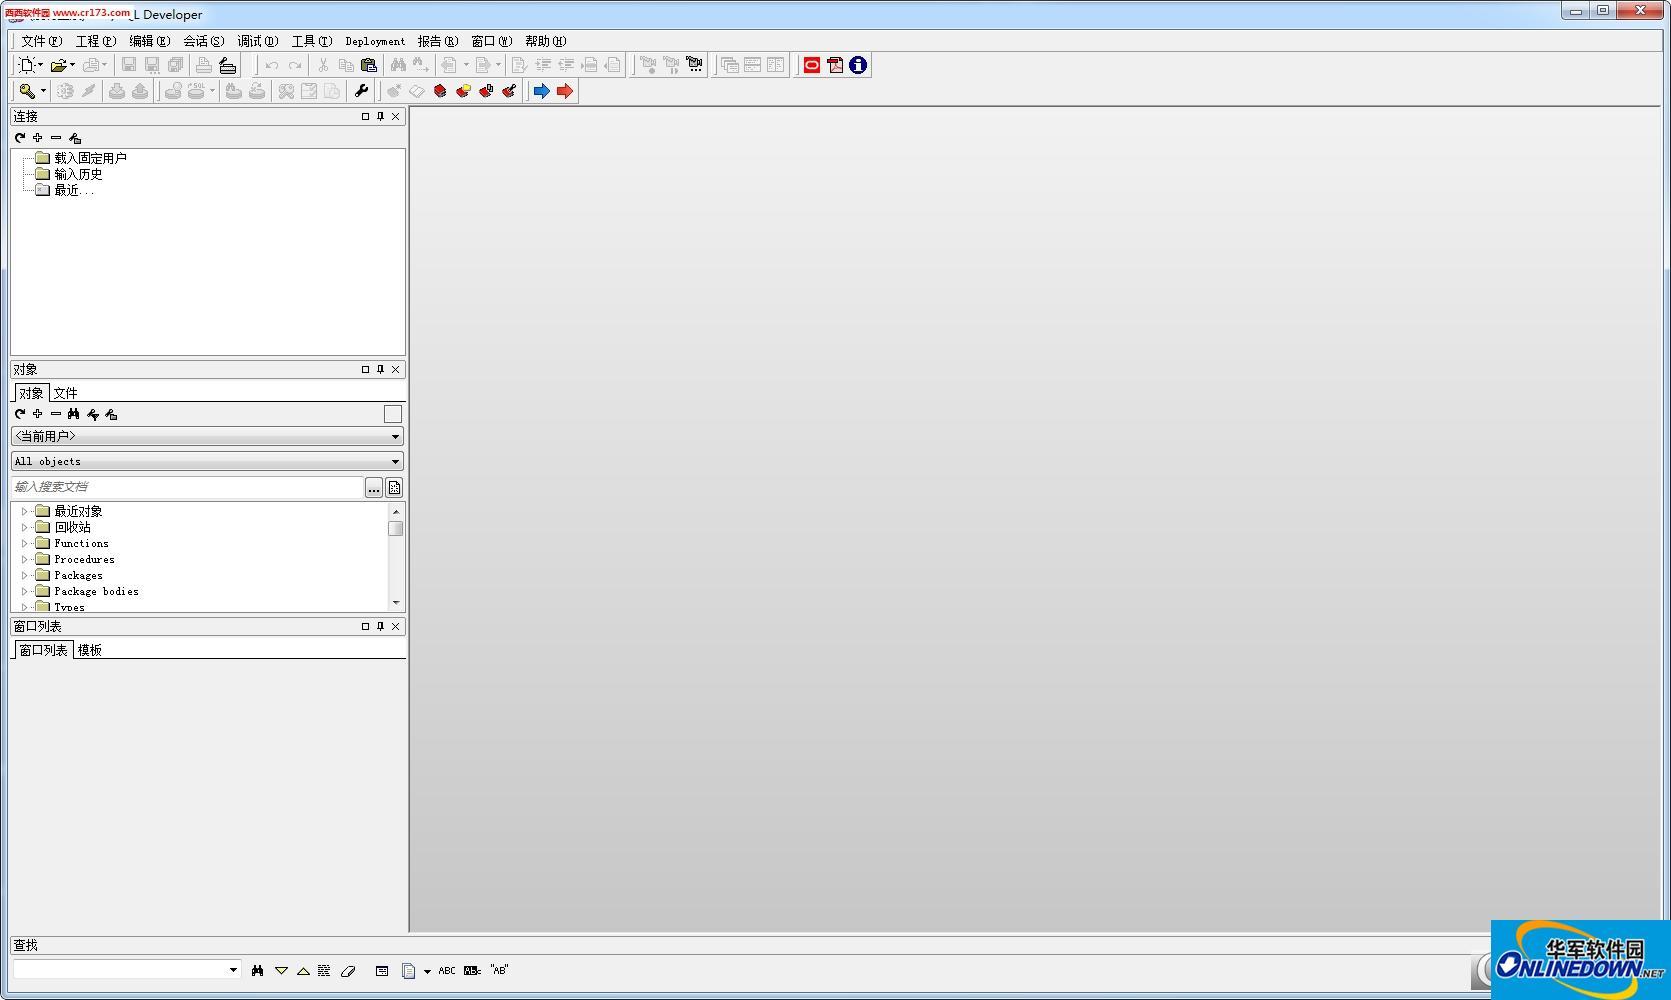 PLSQL Developer 64位(附注册码)